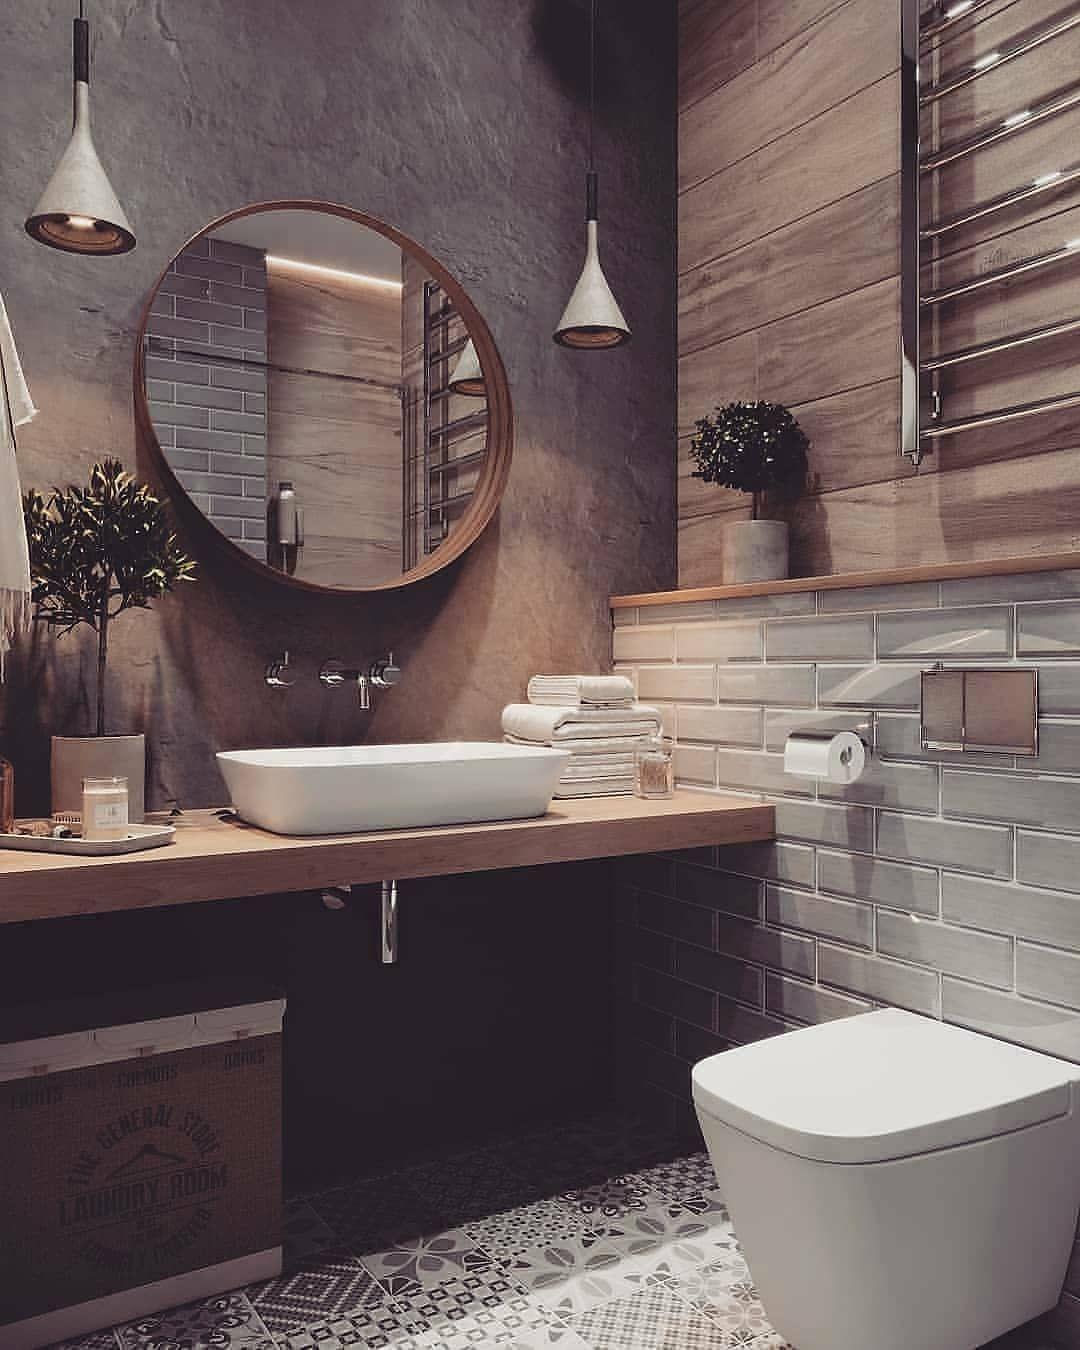 Dizajn Interera Sto Instagram Dizajn V Stile Loft Design Loft Design Bathroom Des Best Bathroom Designs Bathroom Interior Bathroom Inspiration